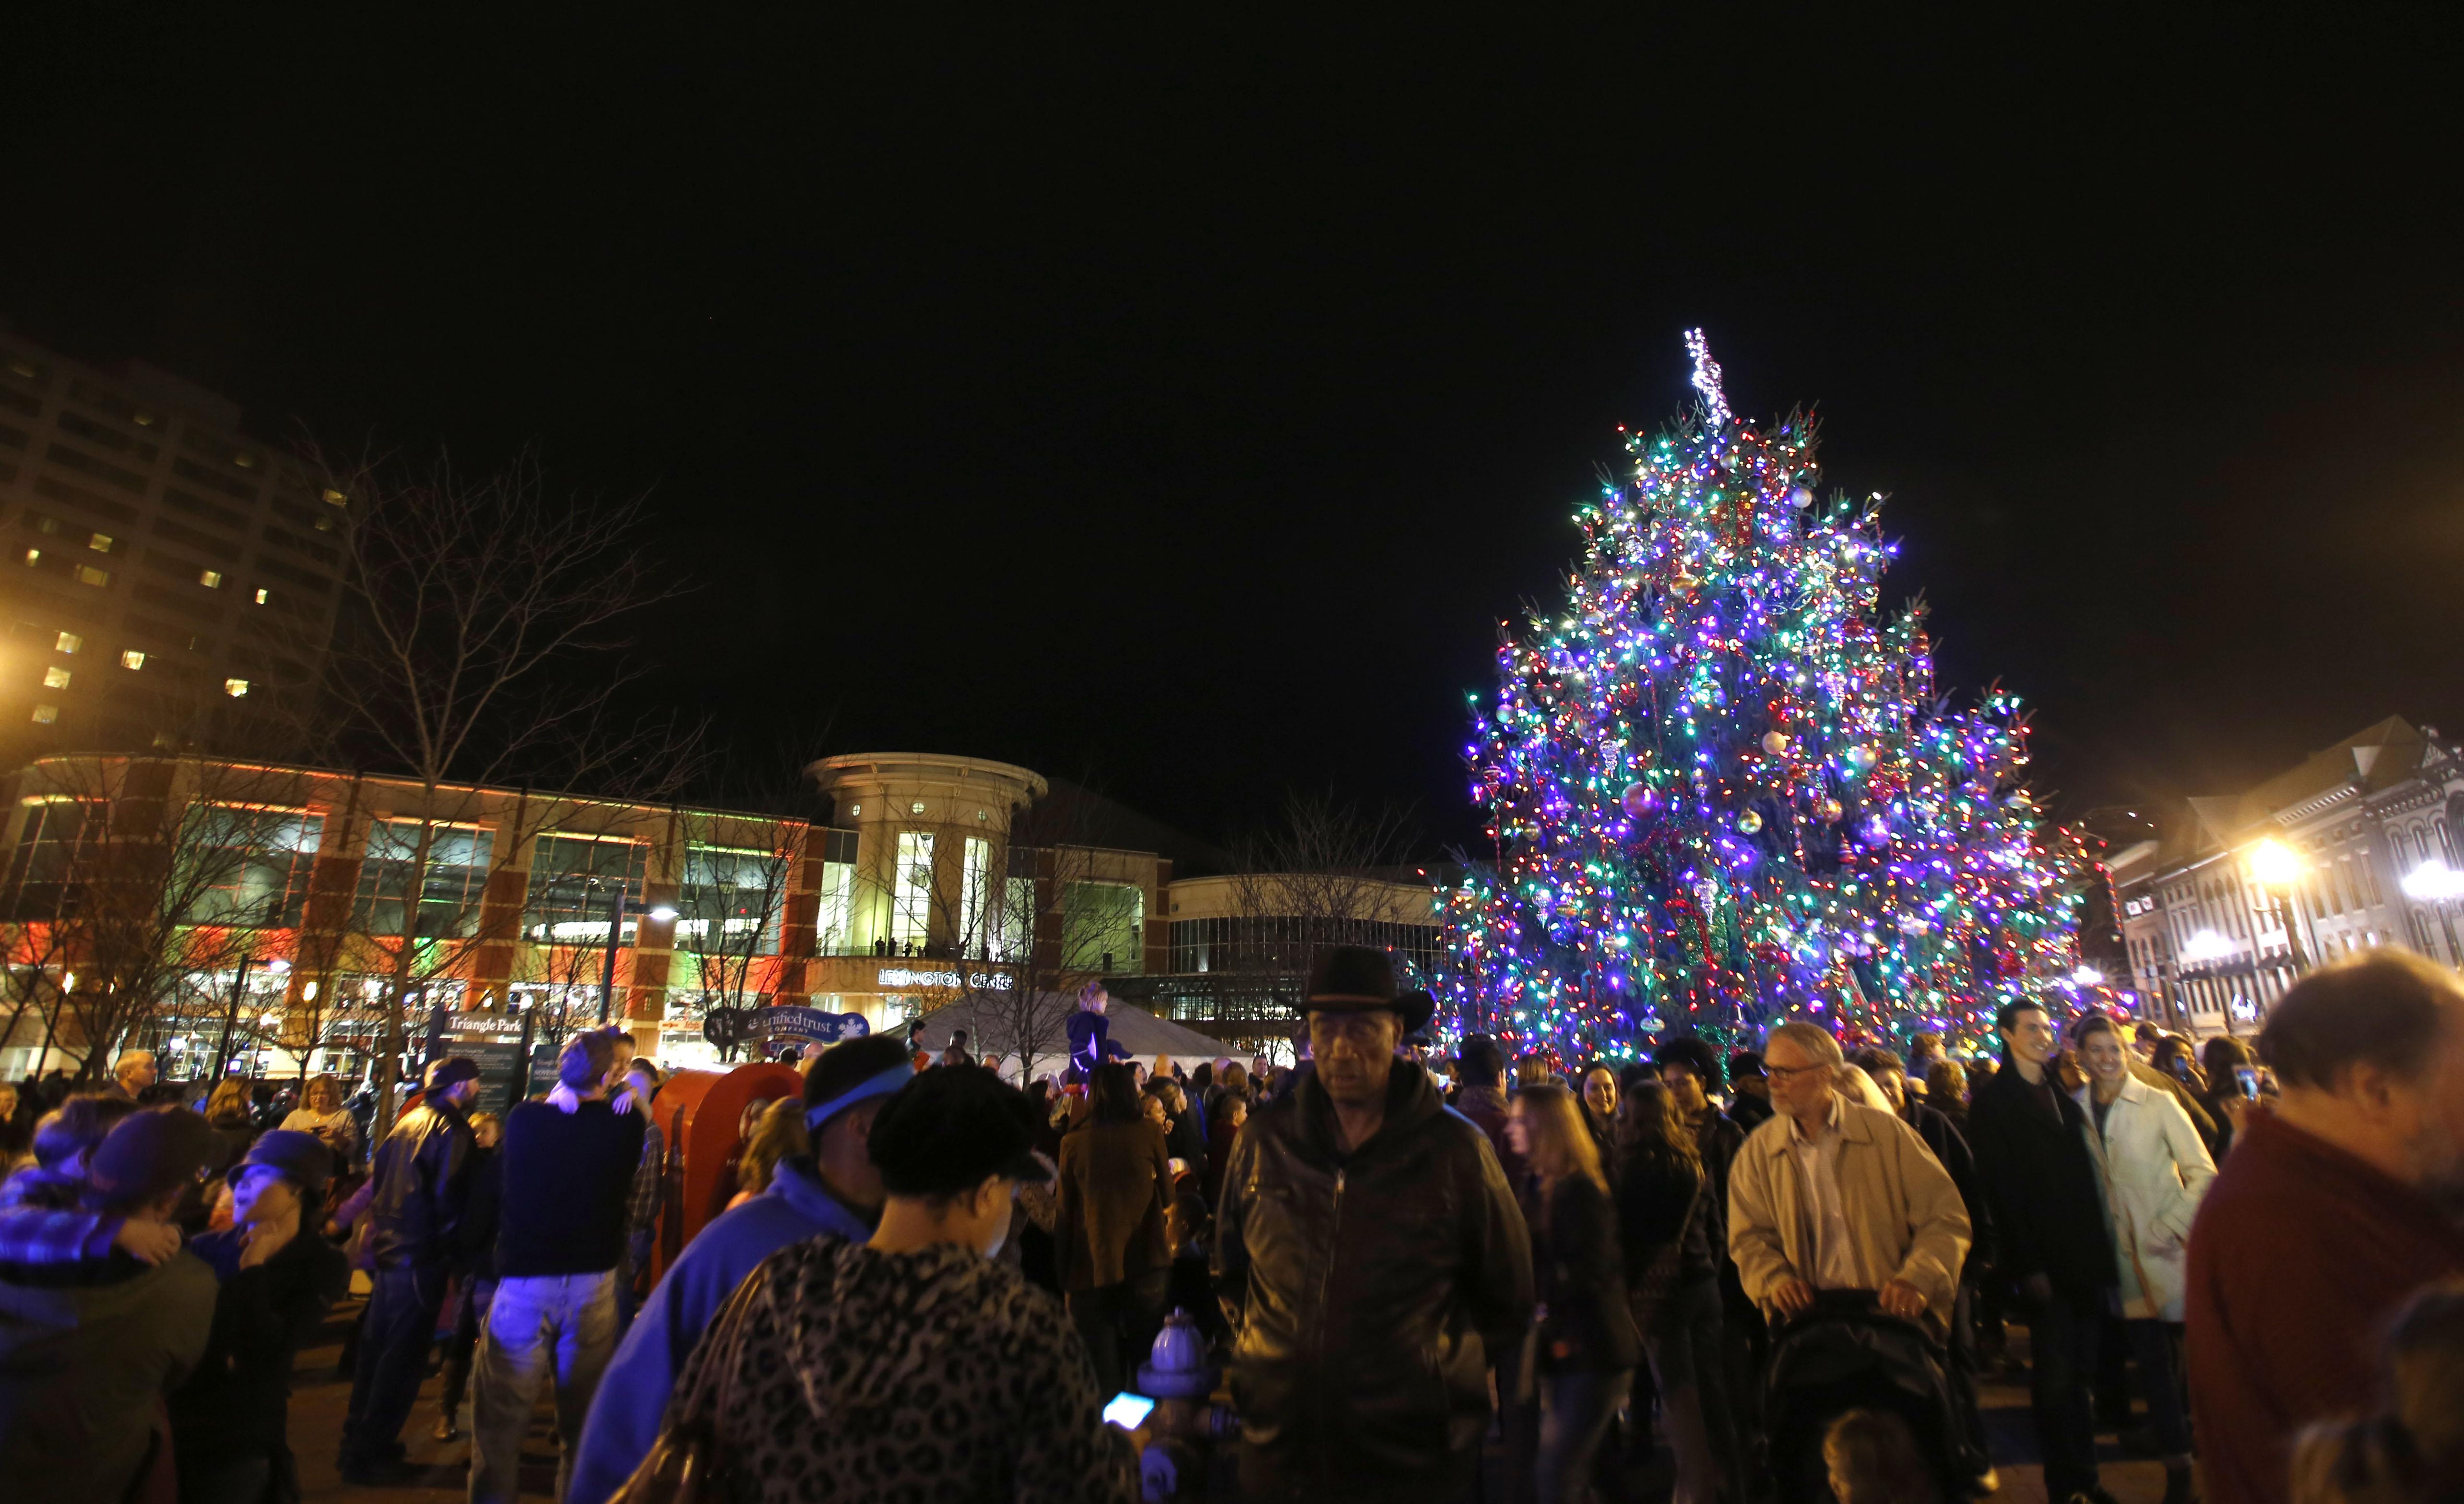 Lexington Christmas Tree Lighting 2020 City seeking two Christmas trees for downtown | City of Lexington